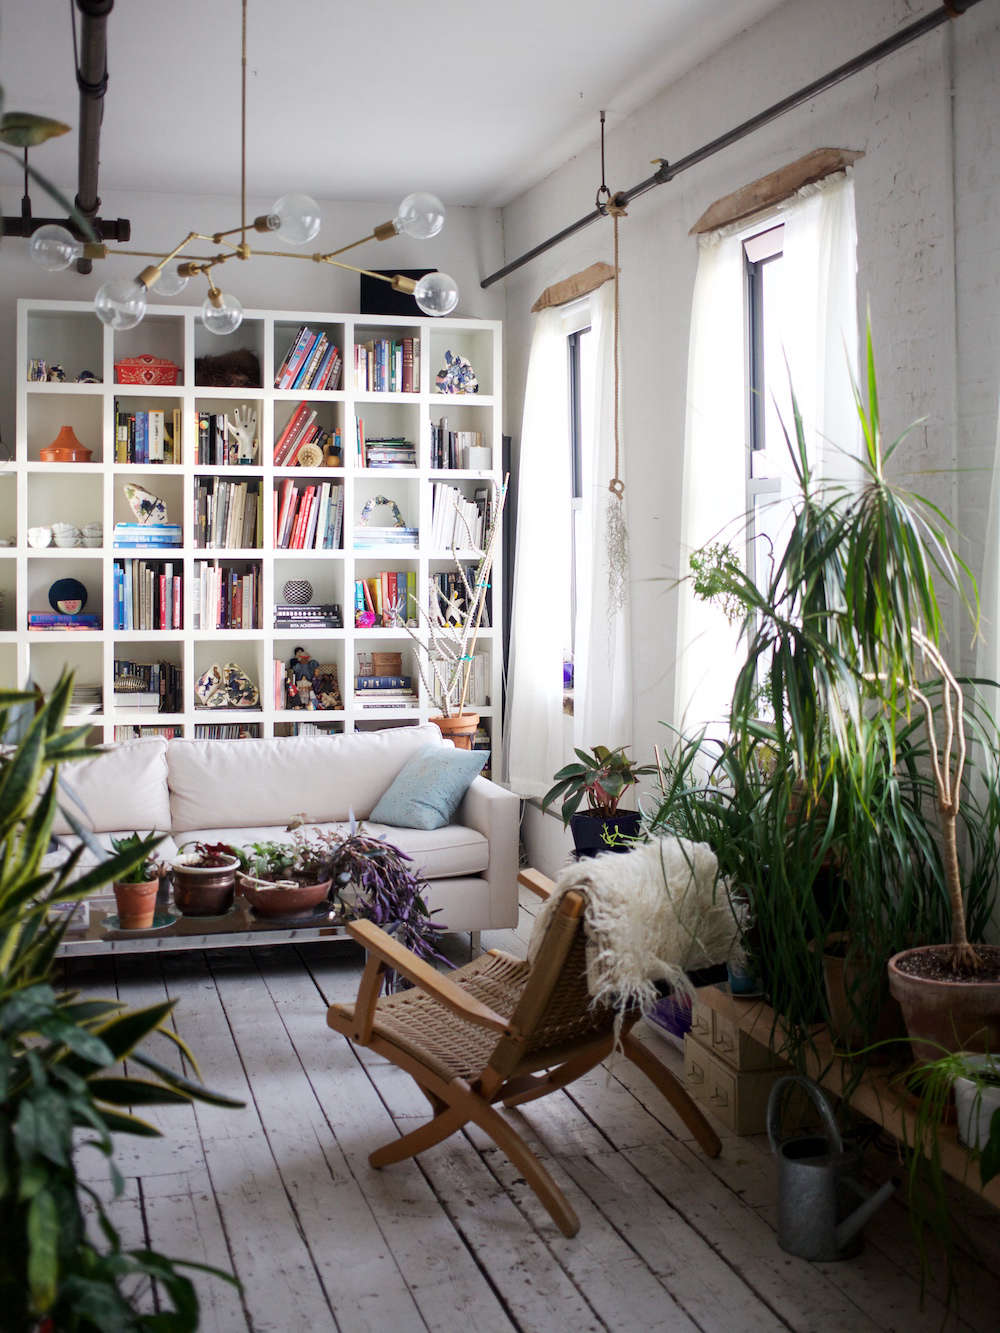 The Accidental Jungle: Shabd Simon-Alexander's Houseplants ... on bathroom filled with plants, bedroom filled with plants, house full of plants, house books,